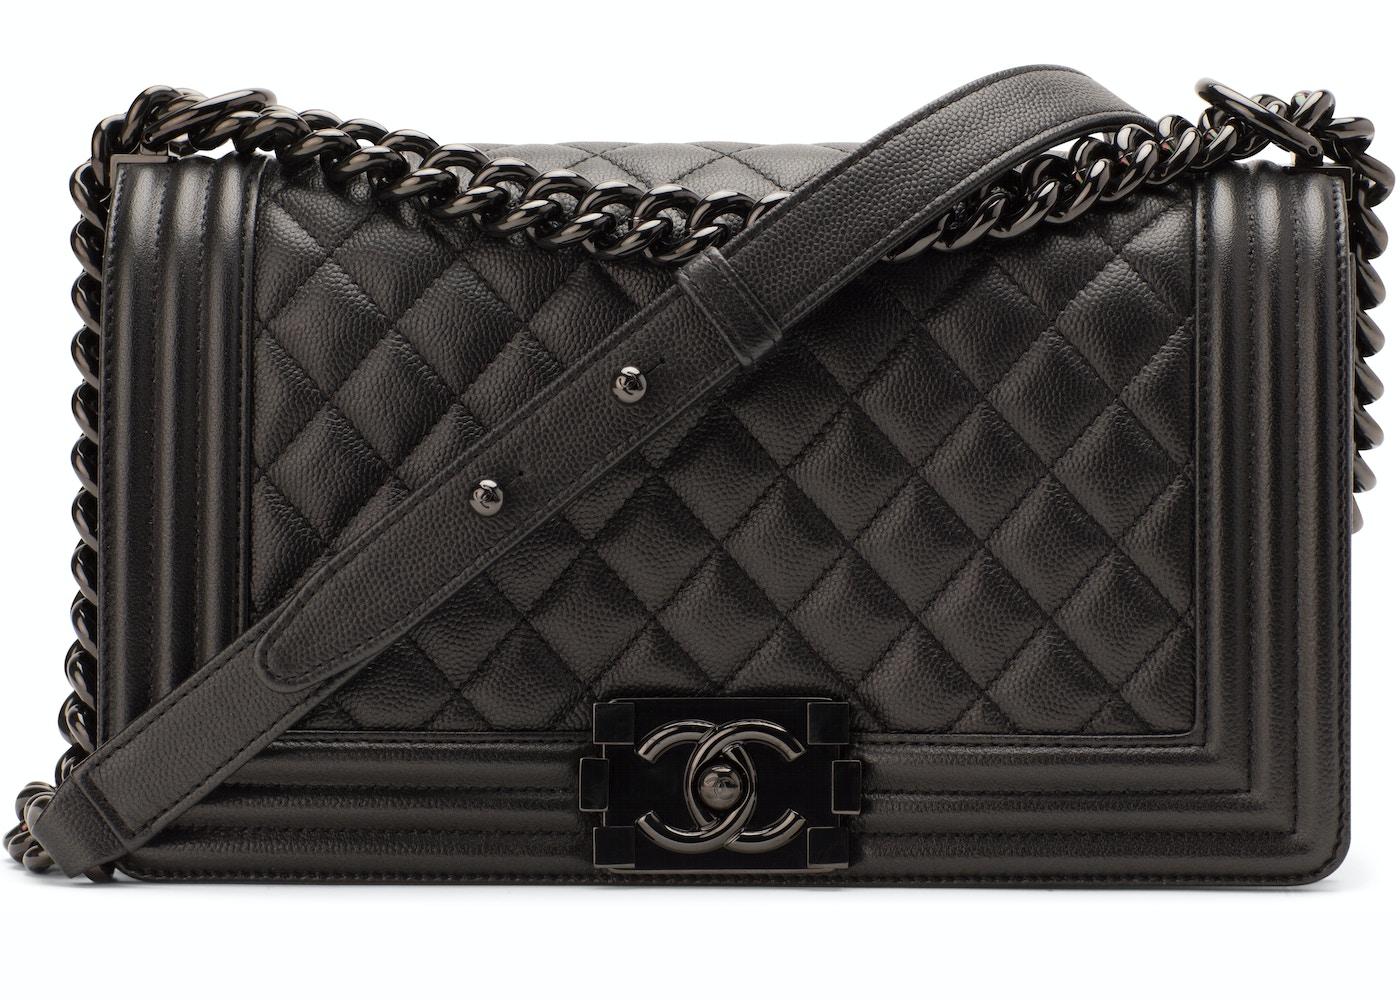 802035f13e Chanel Boy Flap Quilted Medium So Black